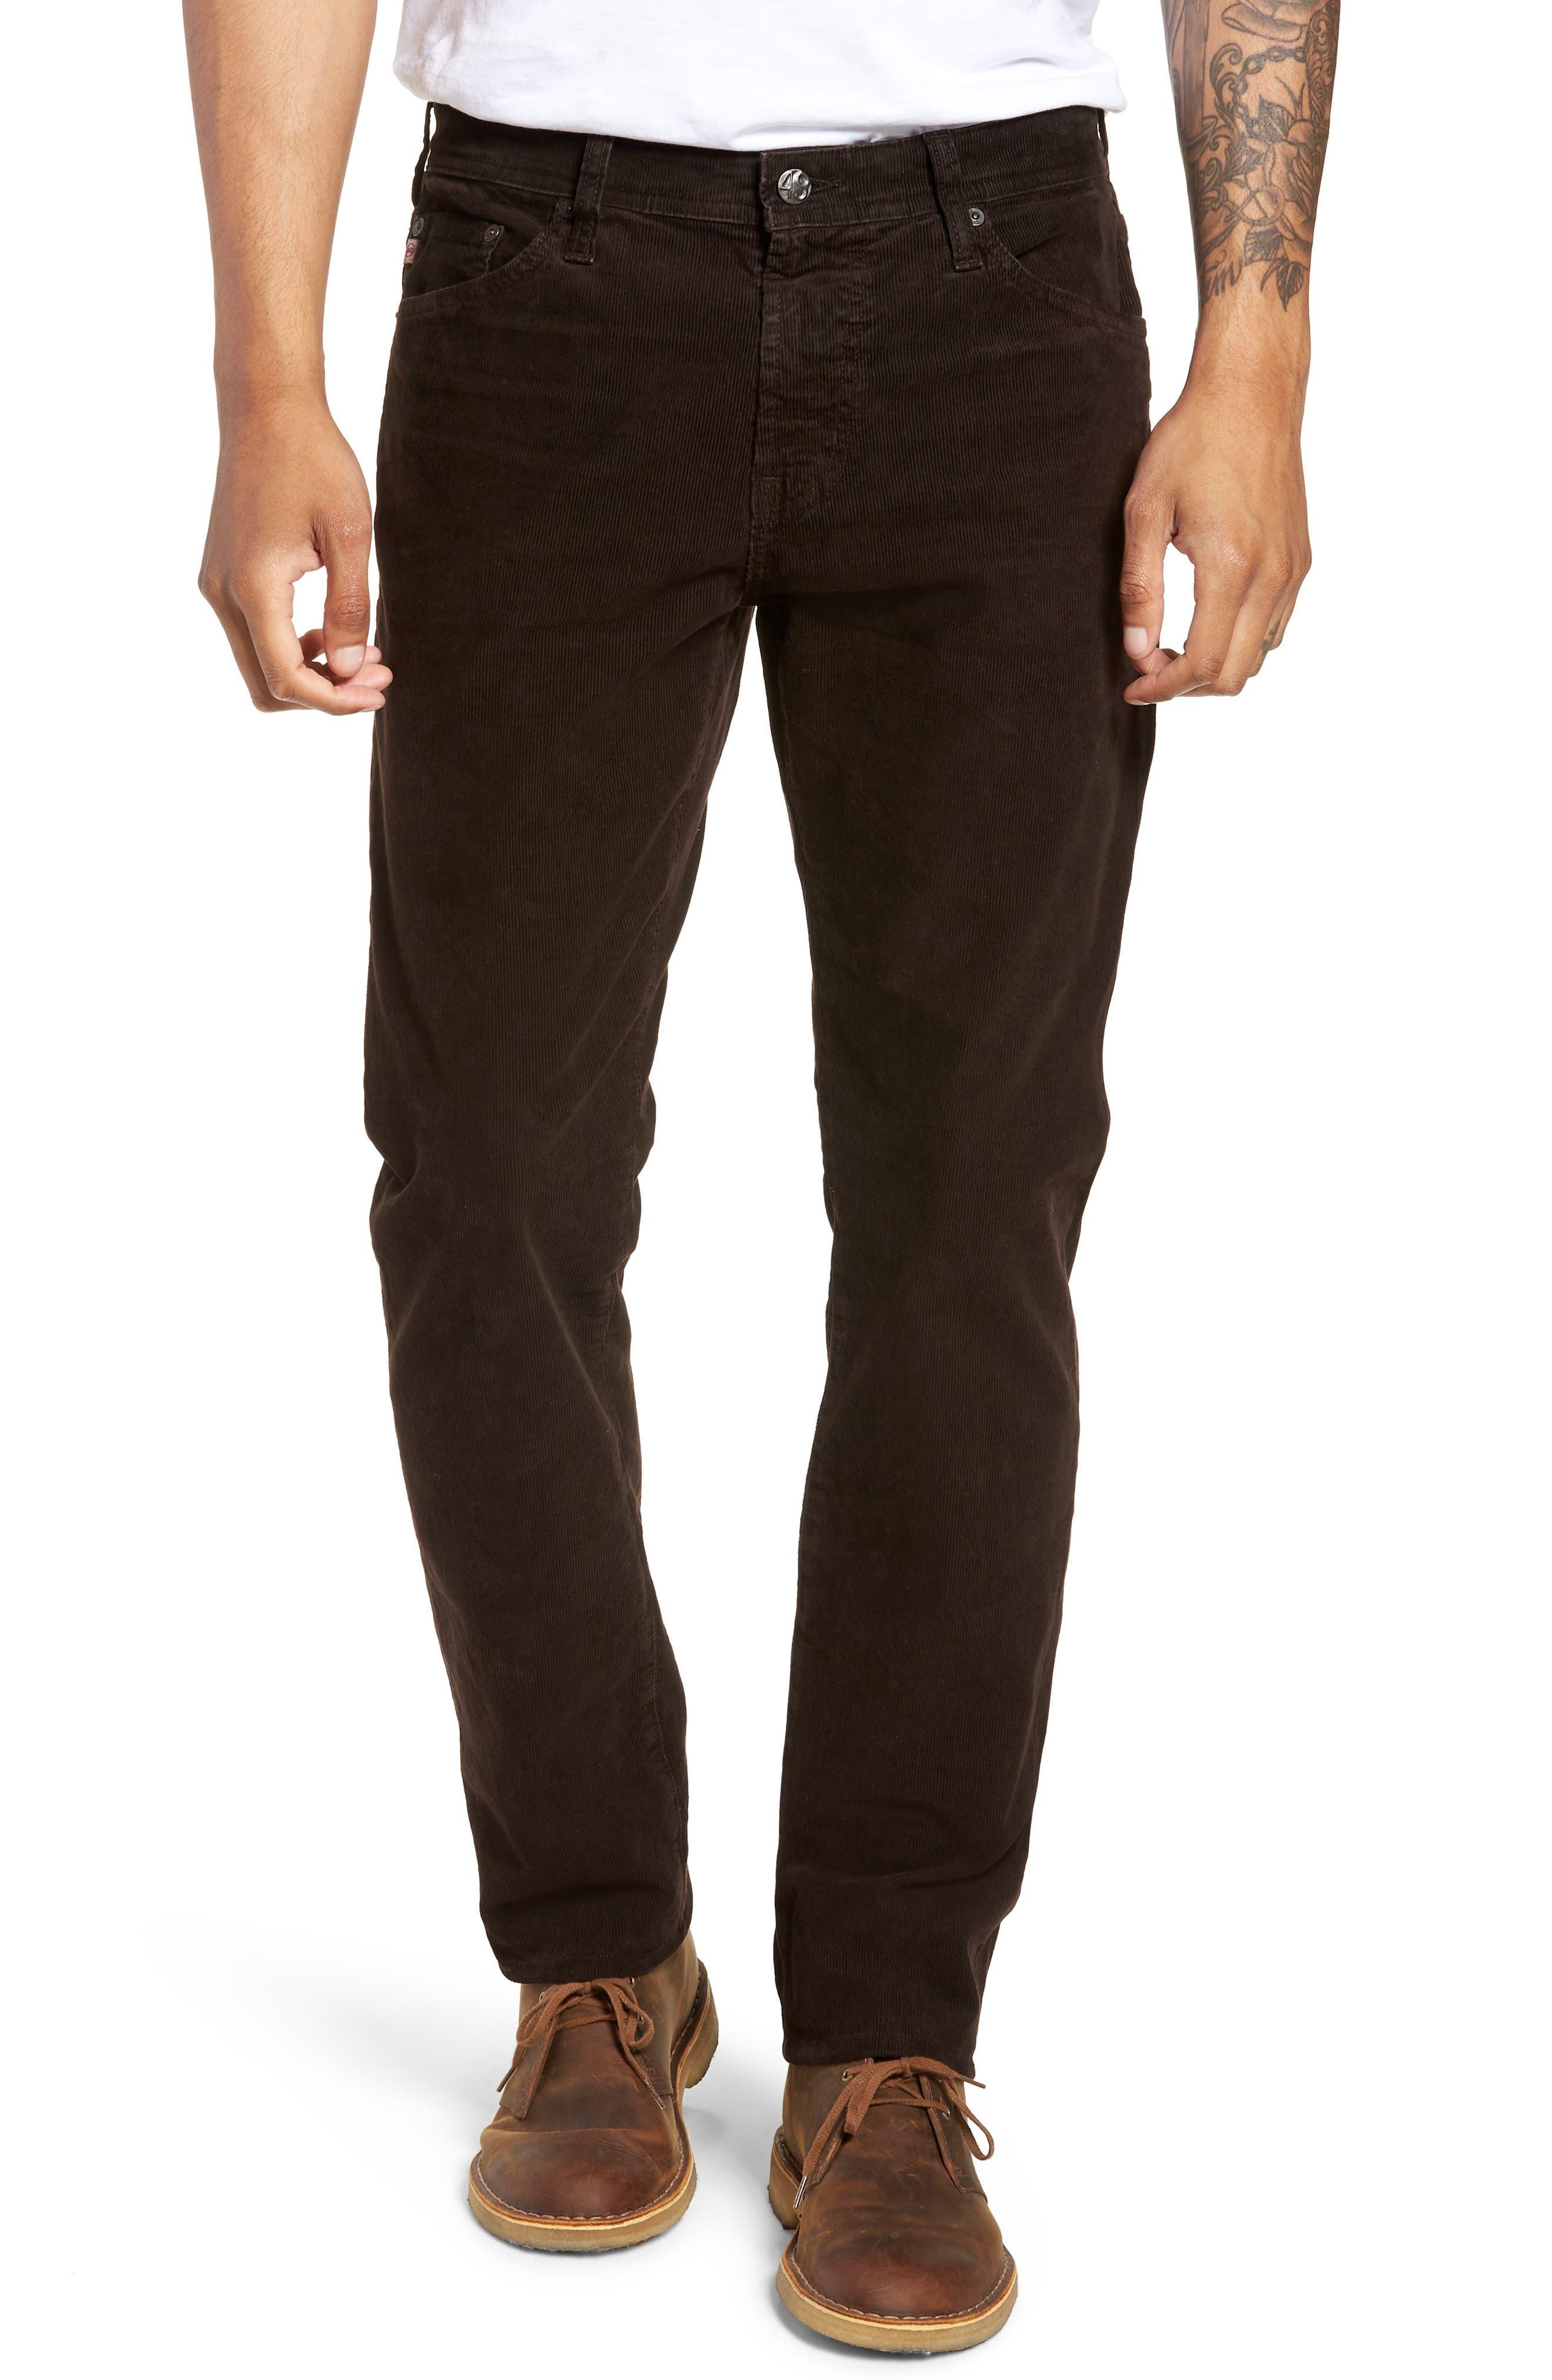 Everett Straight Leg Corduroy Pants,                         Main,                         color, SULFUR SHUTTER